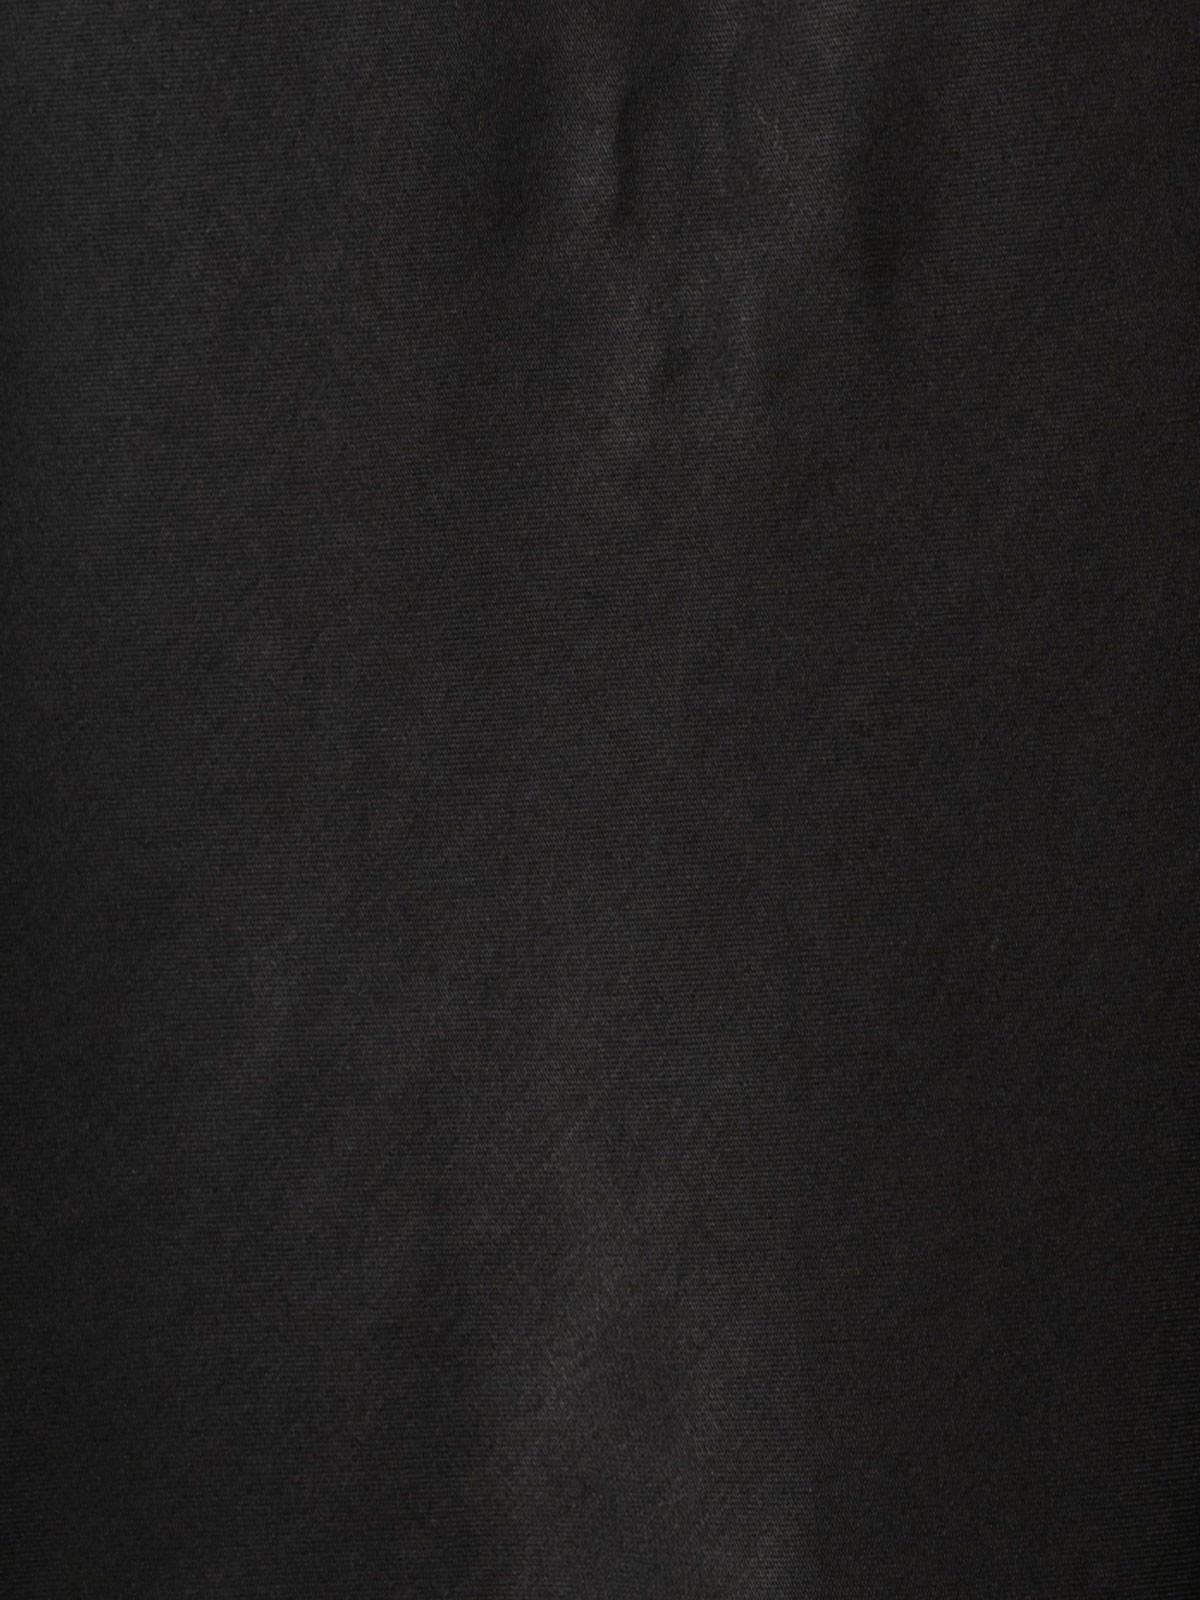 Top mujer lencero frunce Negro